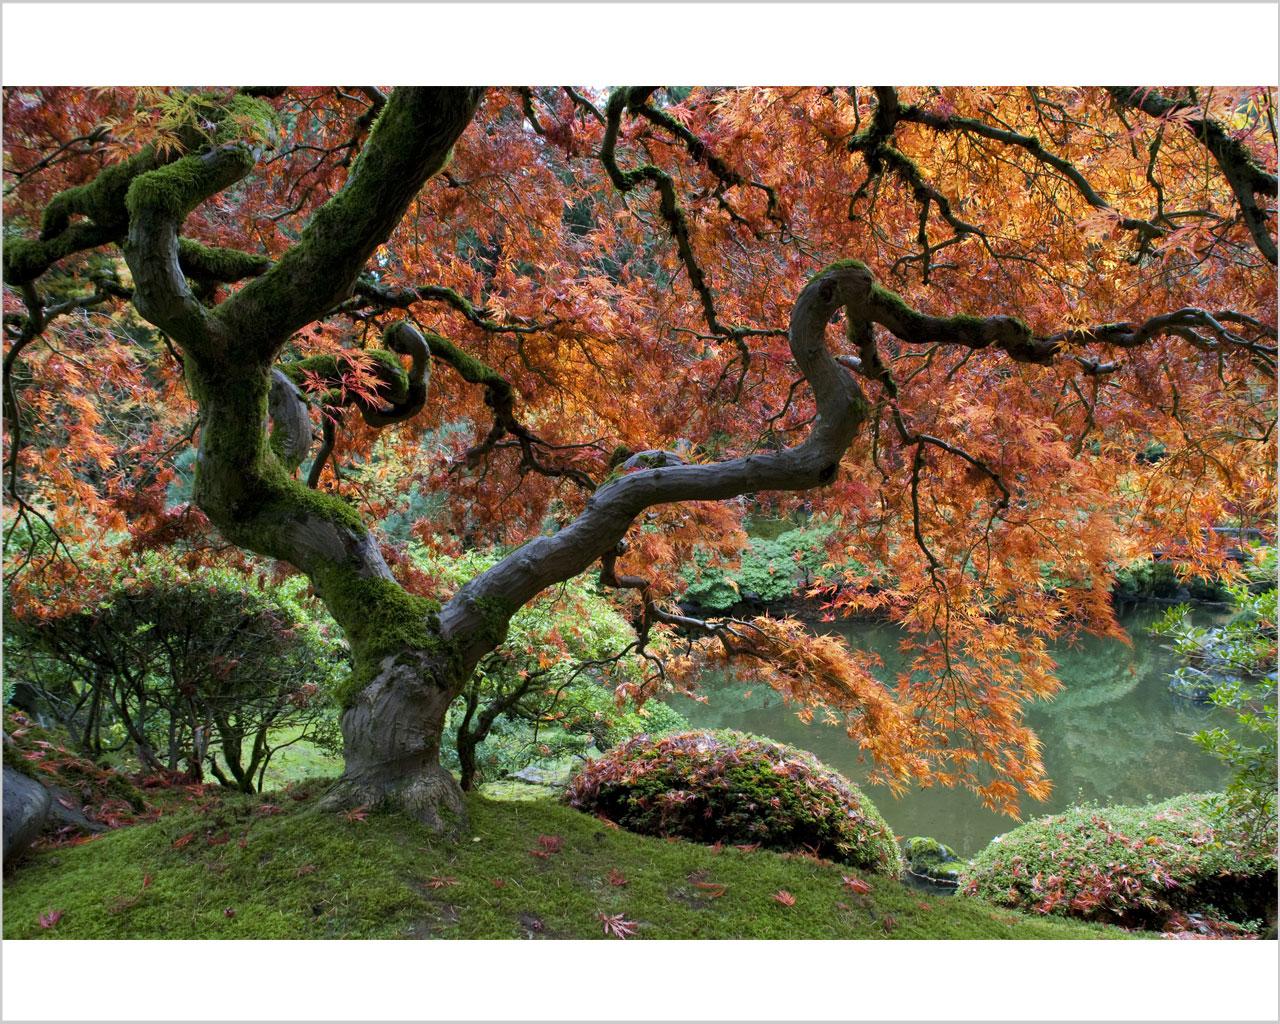 ACERO GIAPPONESE – Natura – Stampa Su Tela  #9A5D31 1280 1024 Dimensione Minima Sala Da Pranzo